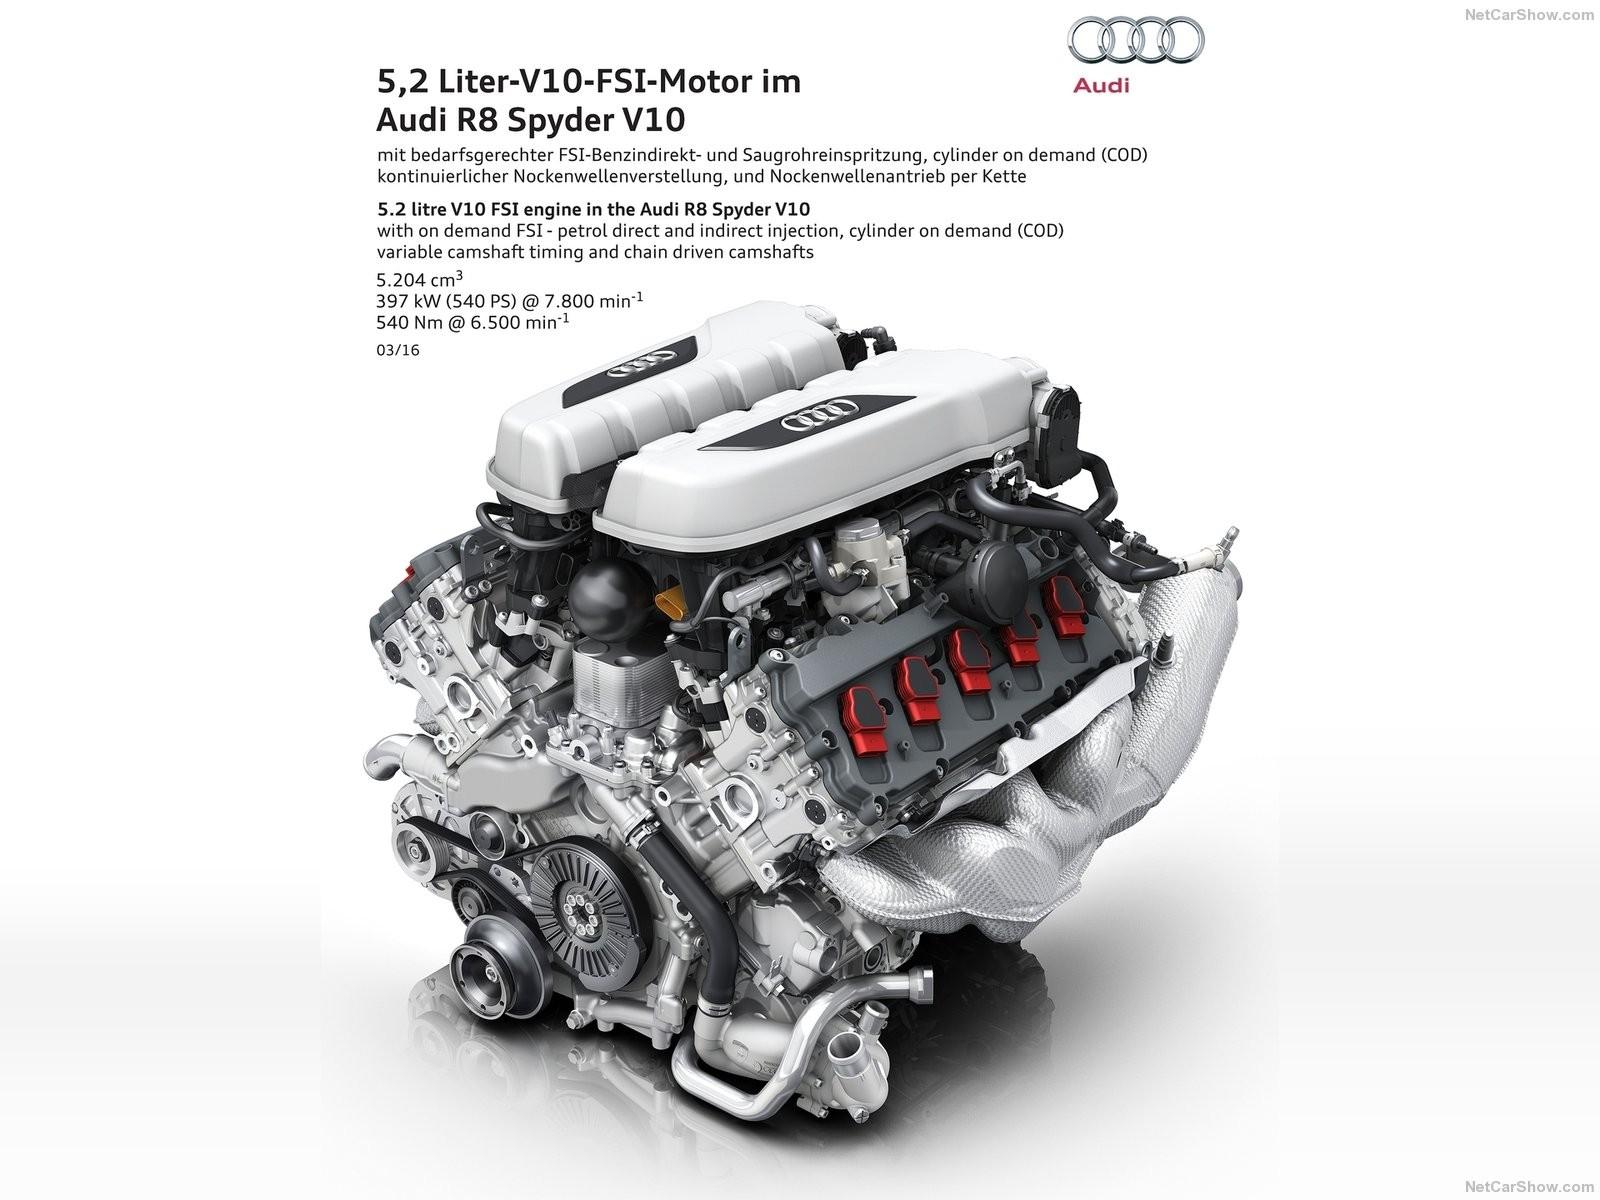 Wallpaper : car, machine, brand, Audi R8, Audi R8 Spyder